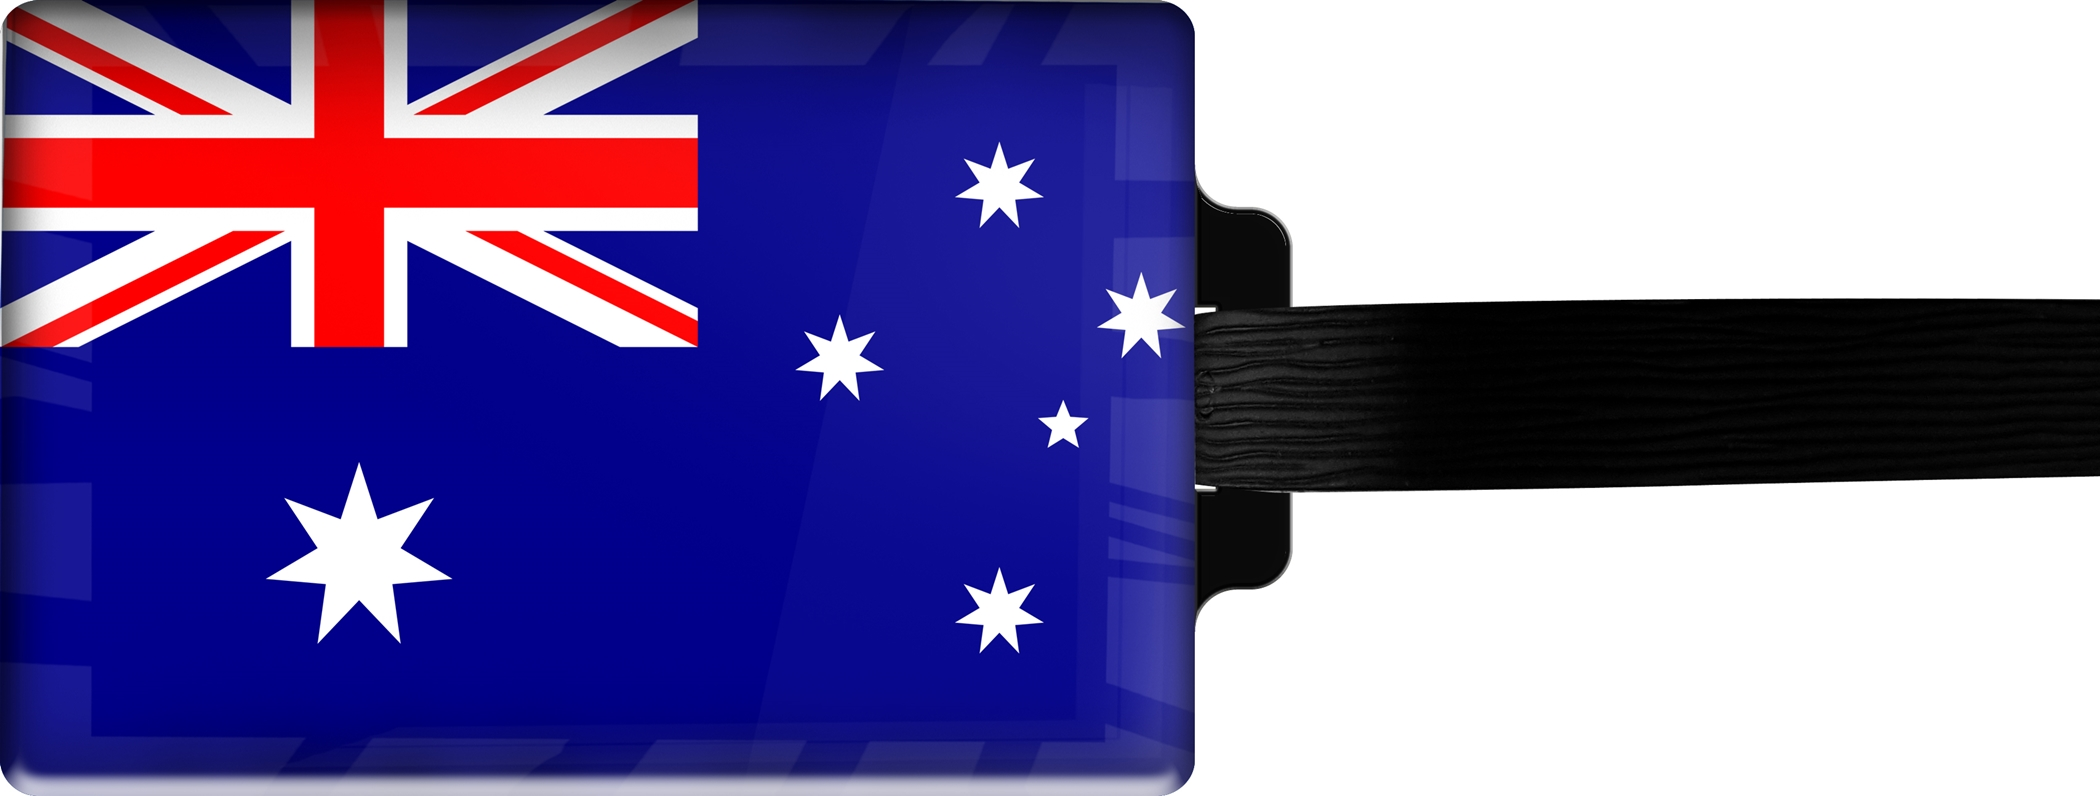 Hochwertiger Gepäckanhänger aus Acrylglas | FLAGGE AUSTRALIEN | metALUm #00076